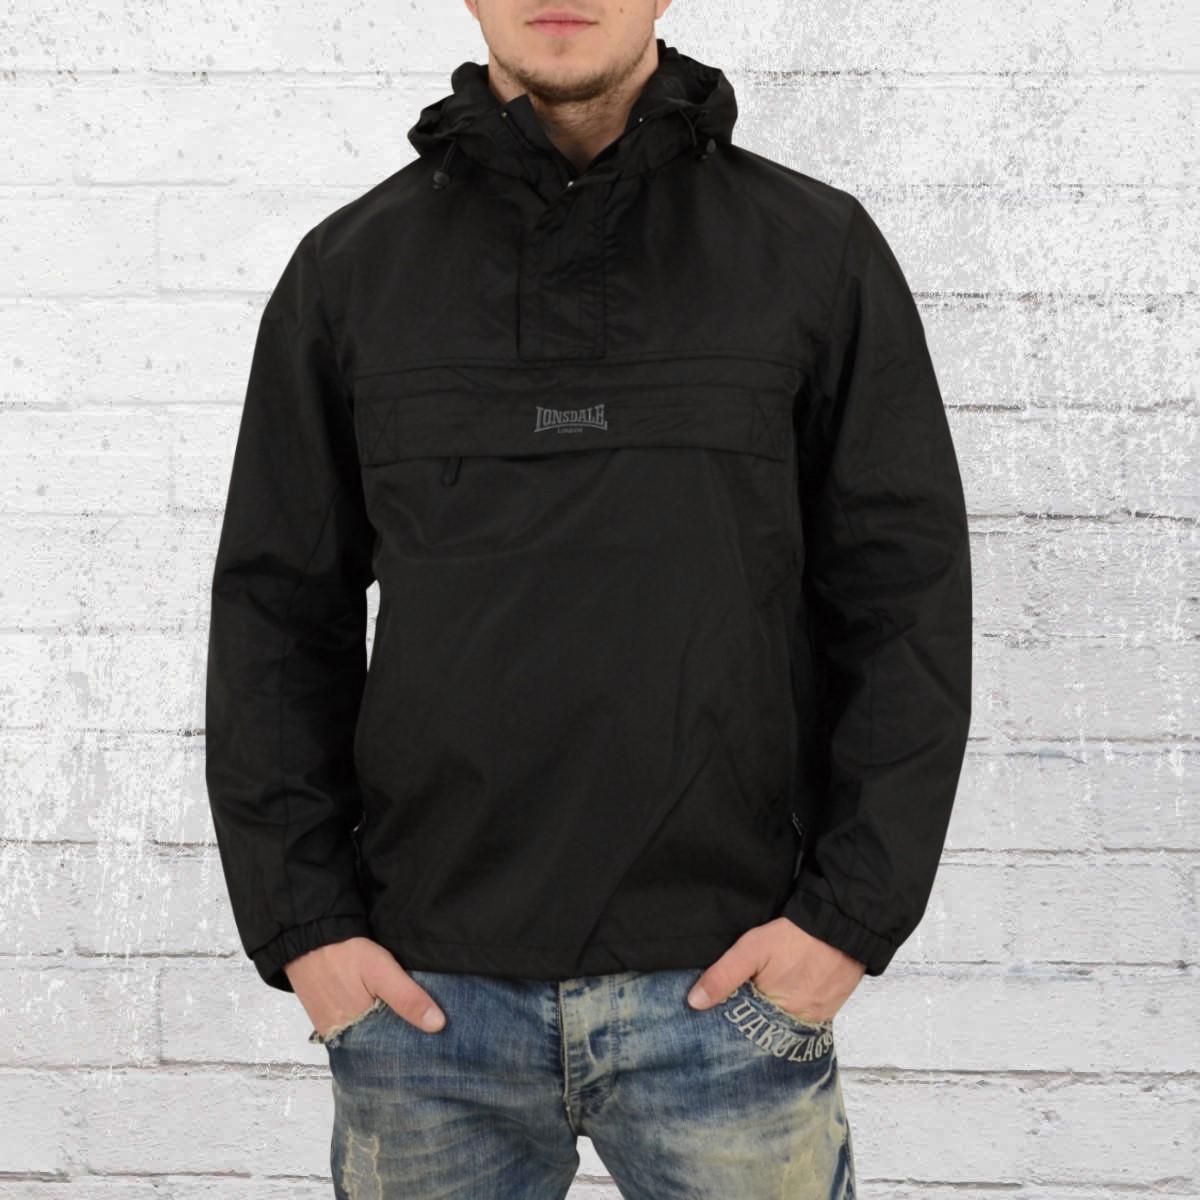 Lonsdale London Mens Windbreaker Jacket Blockbreaker black. ›‹ « ebcfddf032